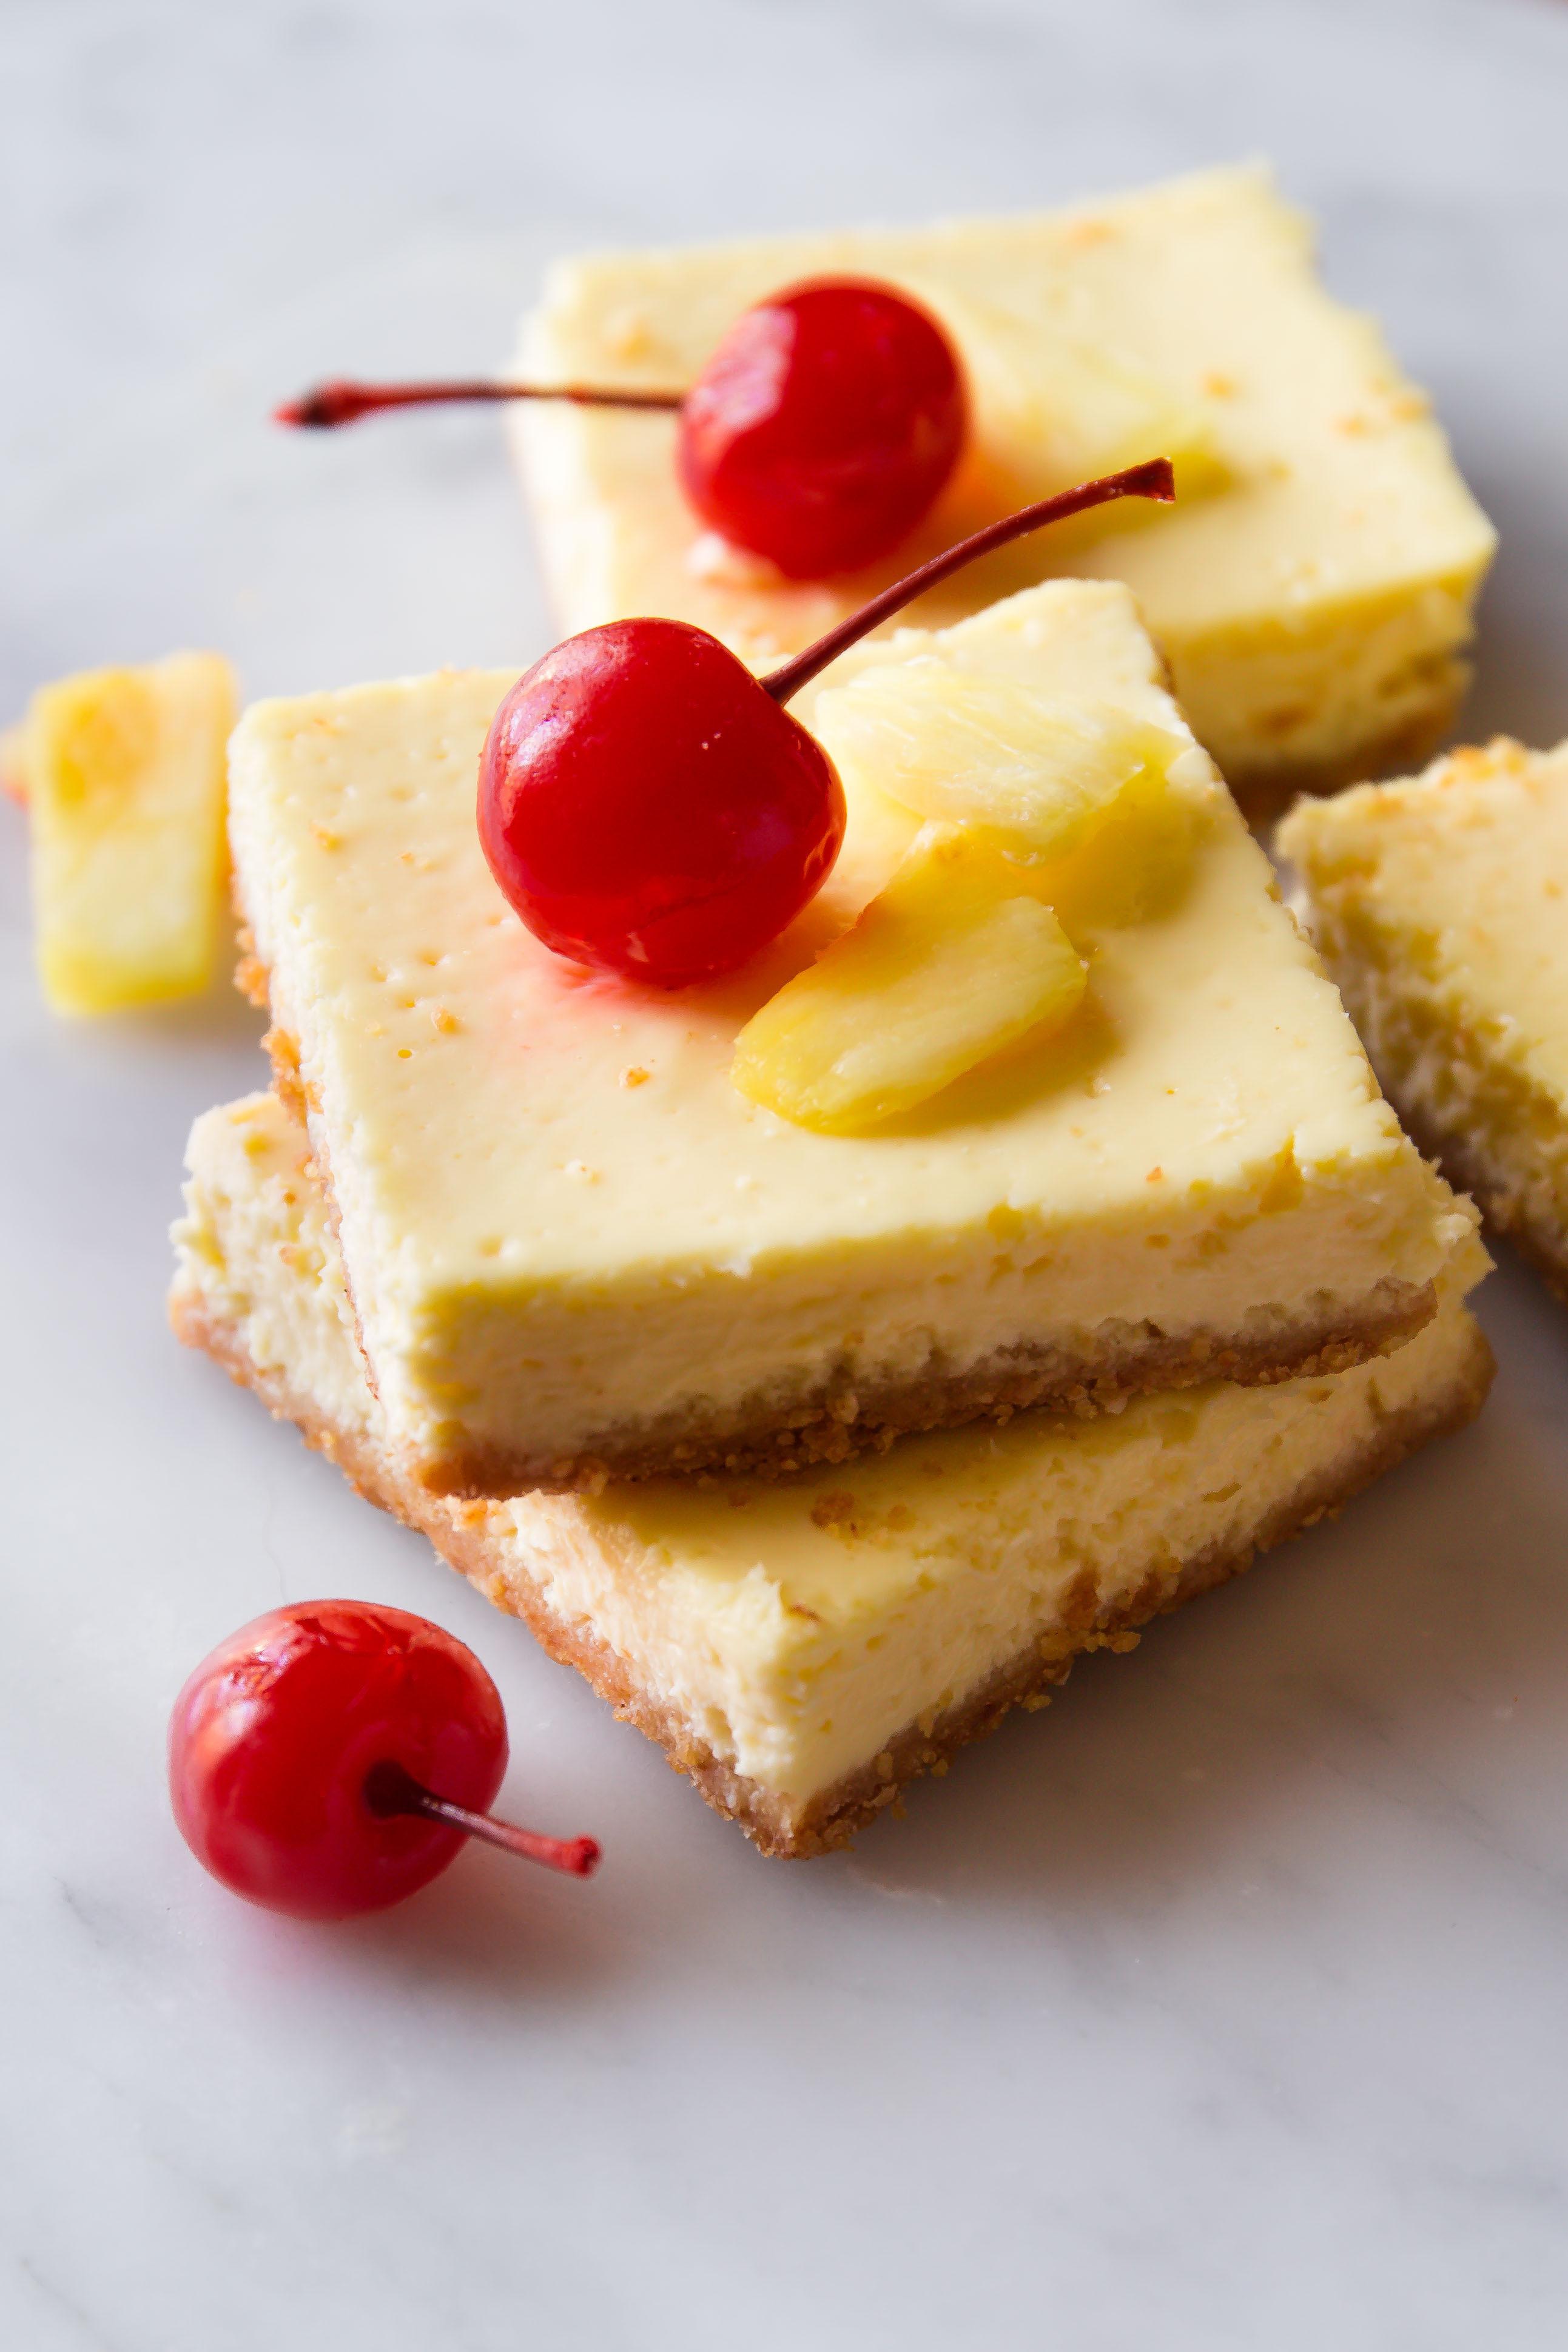 Easy Pineapple Desserts  20 Best Pineapple Desserts Easy Recipes for Pineapple